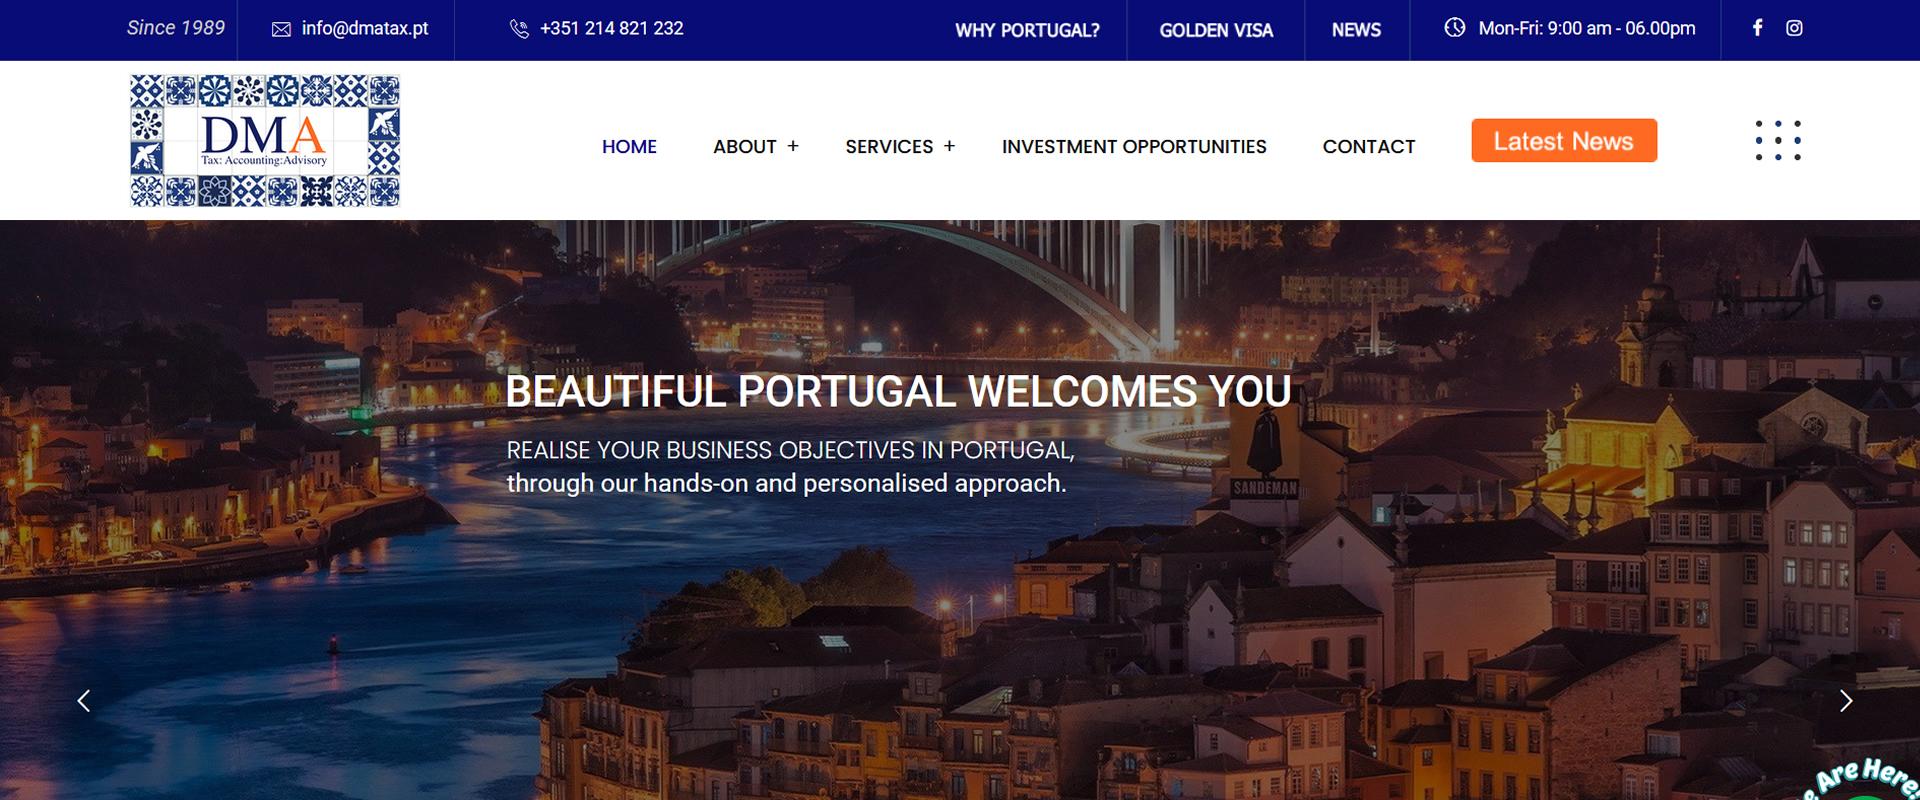 dmatax_portugalcity